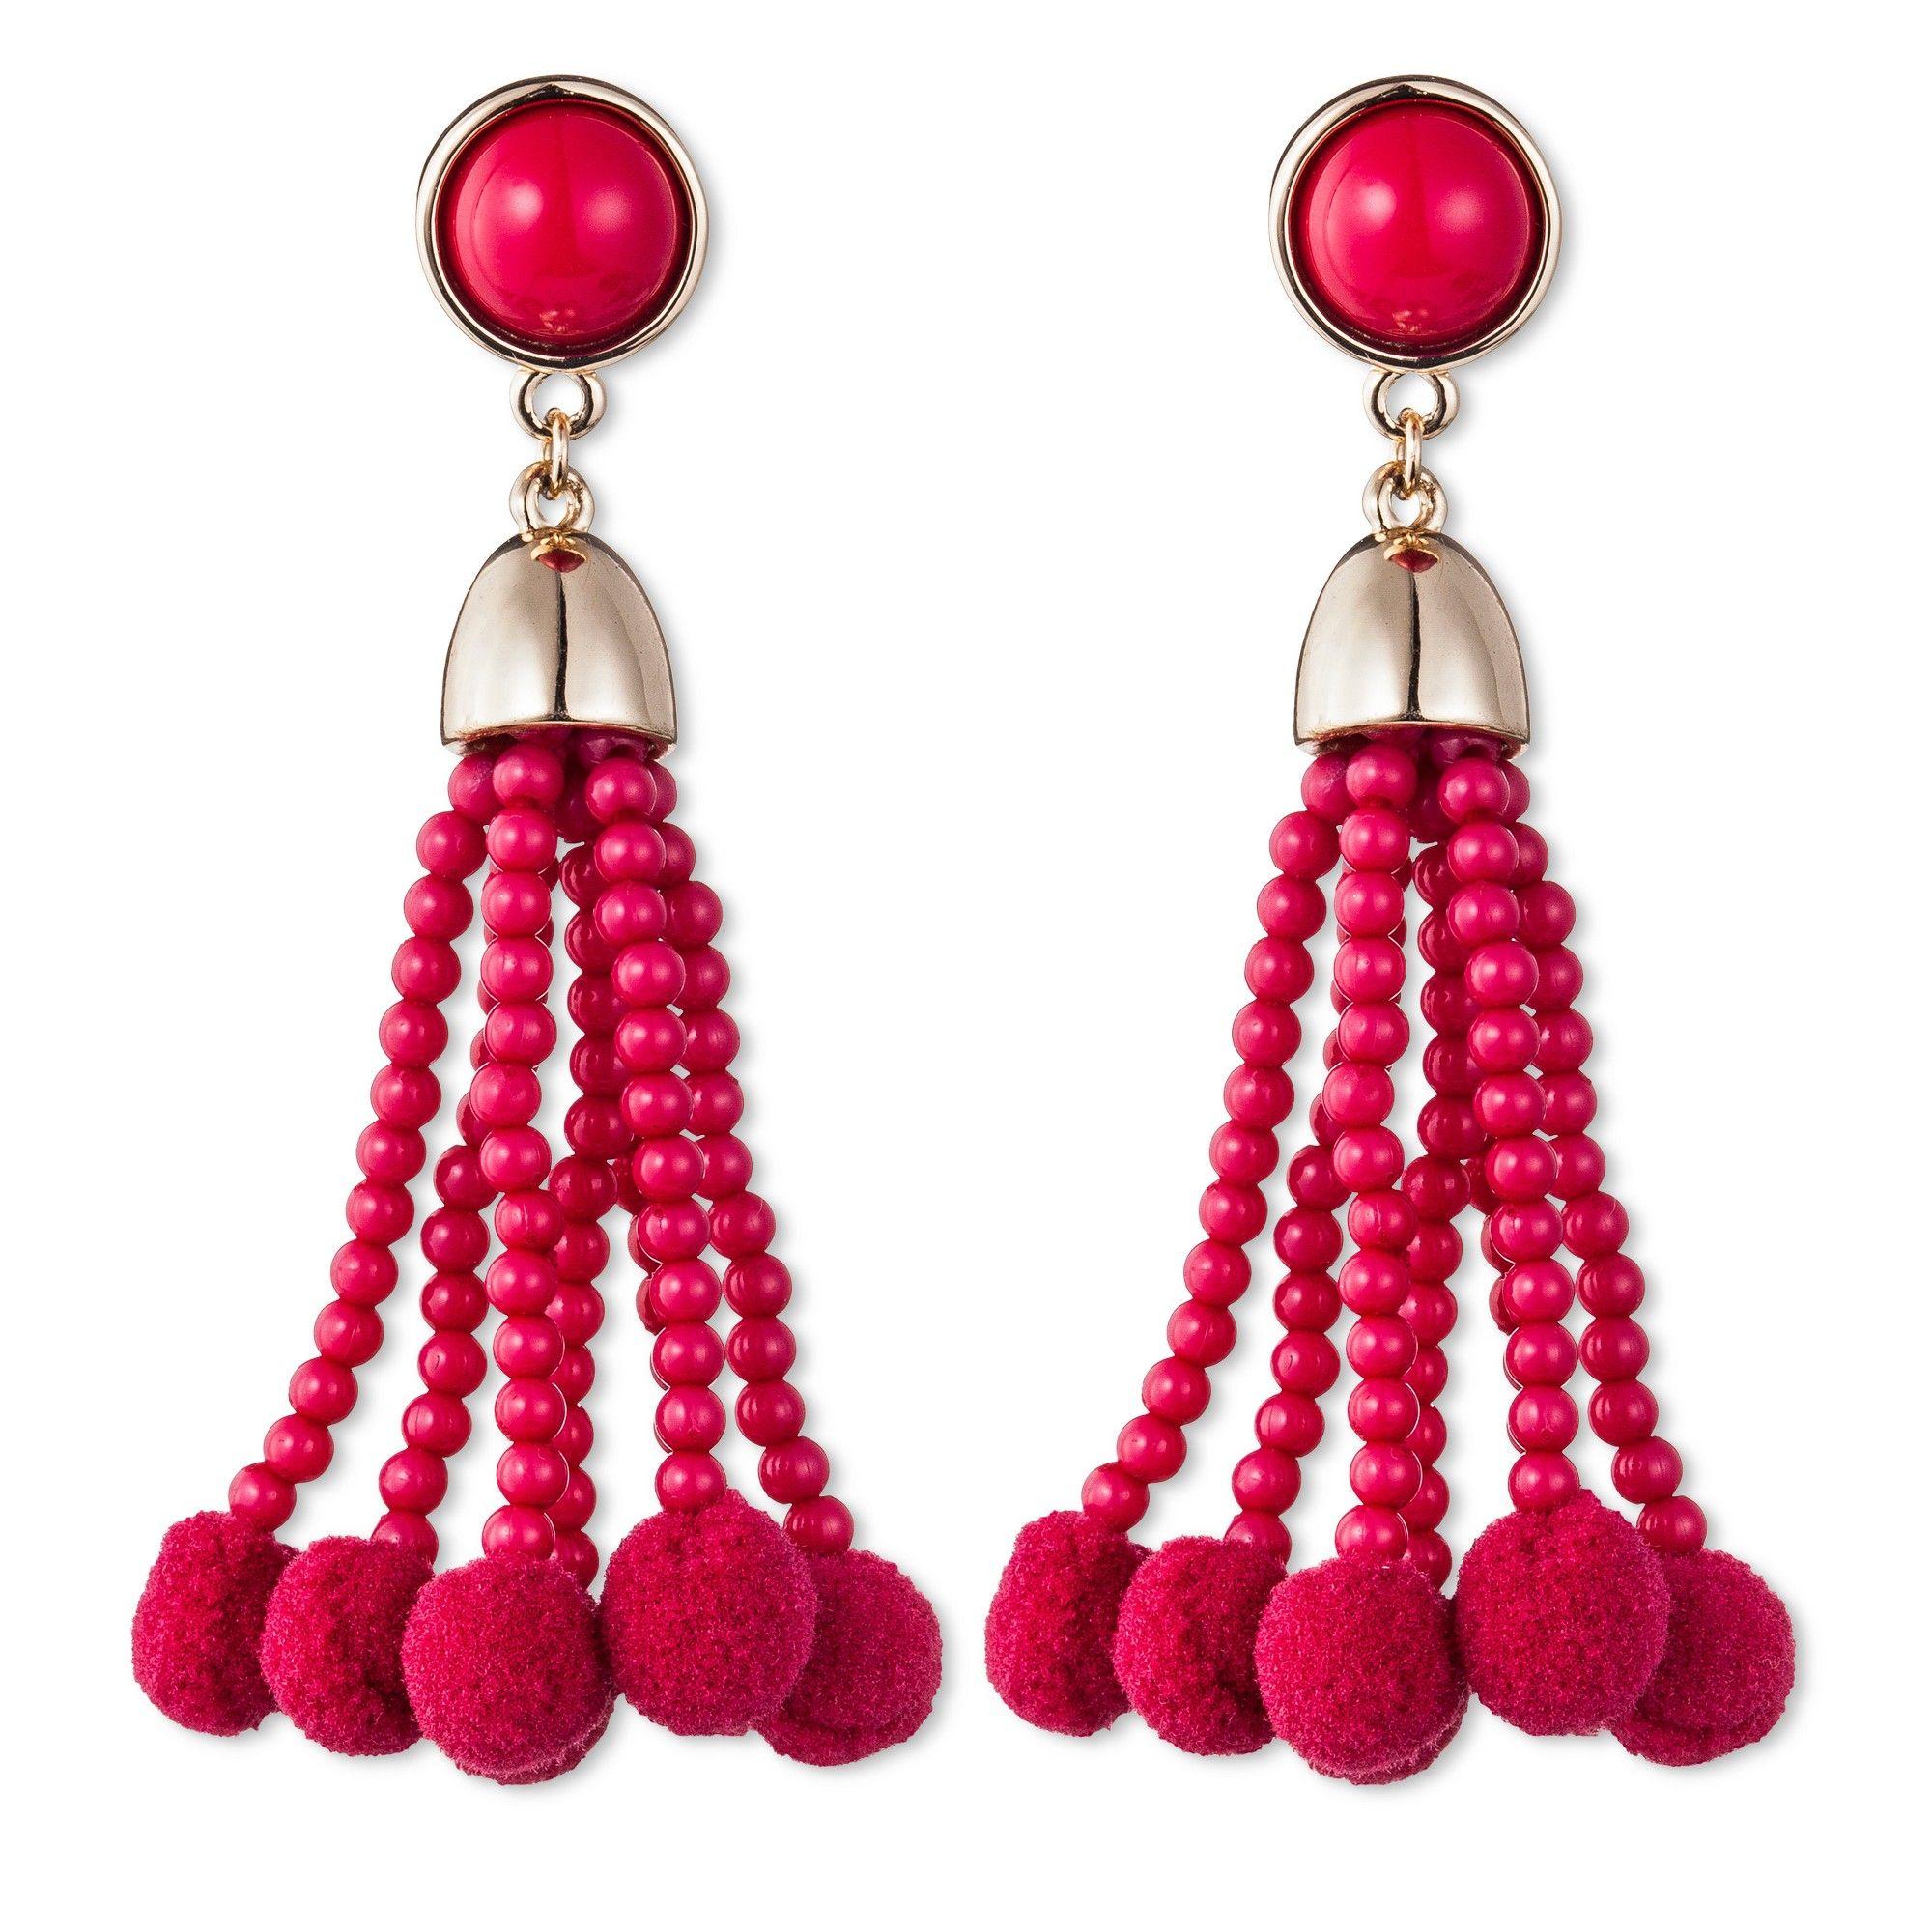 Sugarfix by BaubleBar Beaded Tassel Earrings with Pom Poms